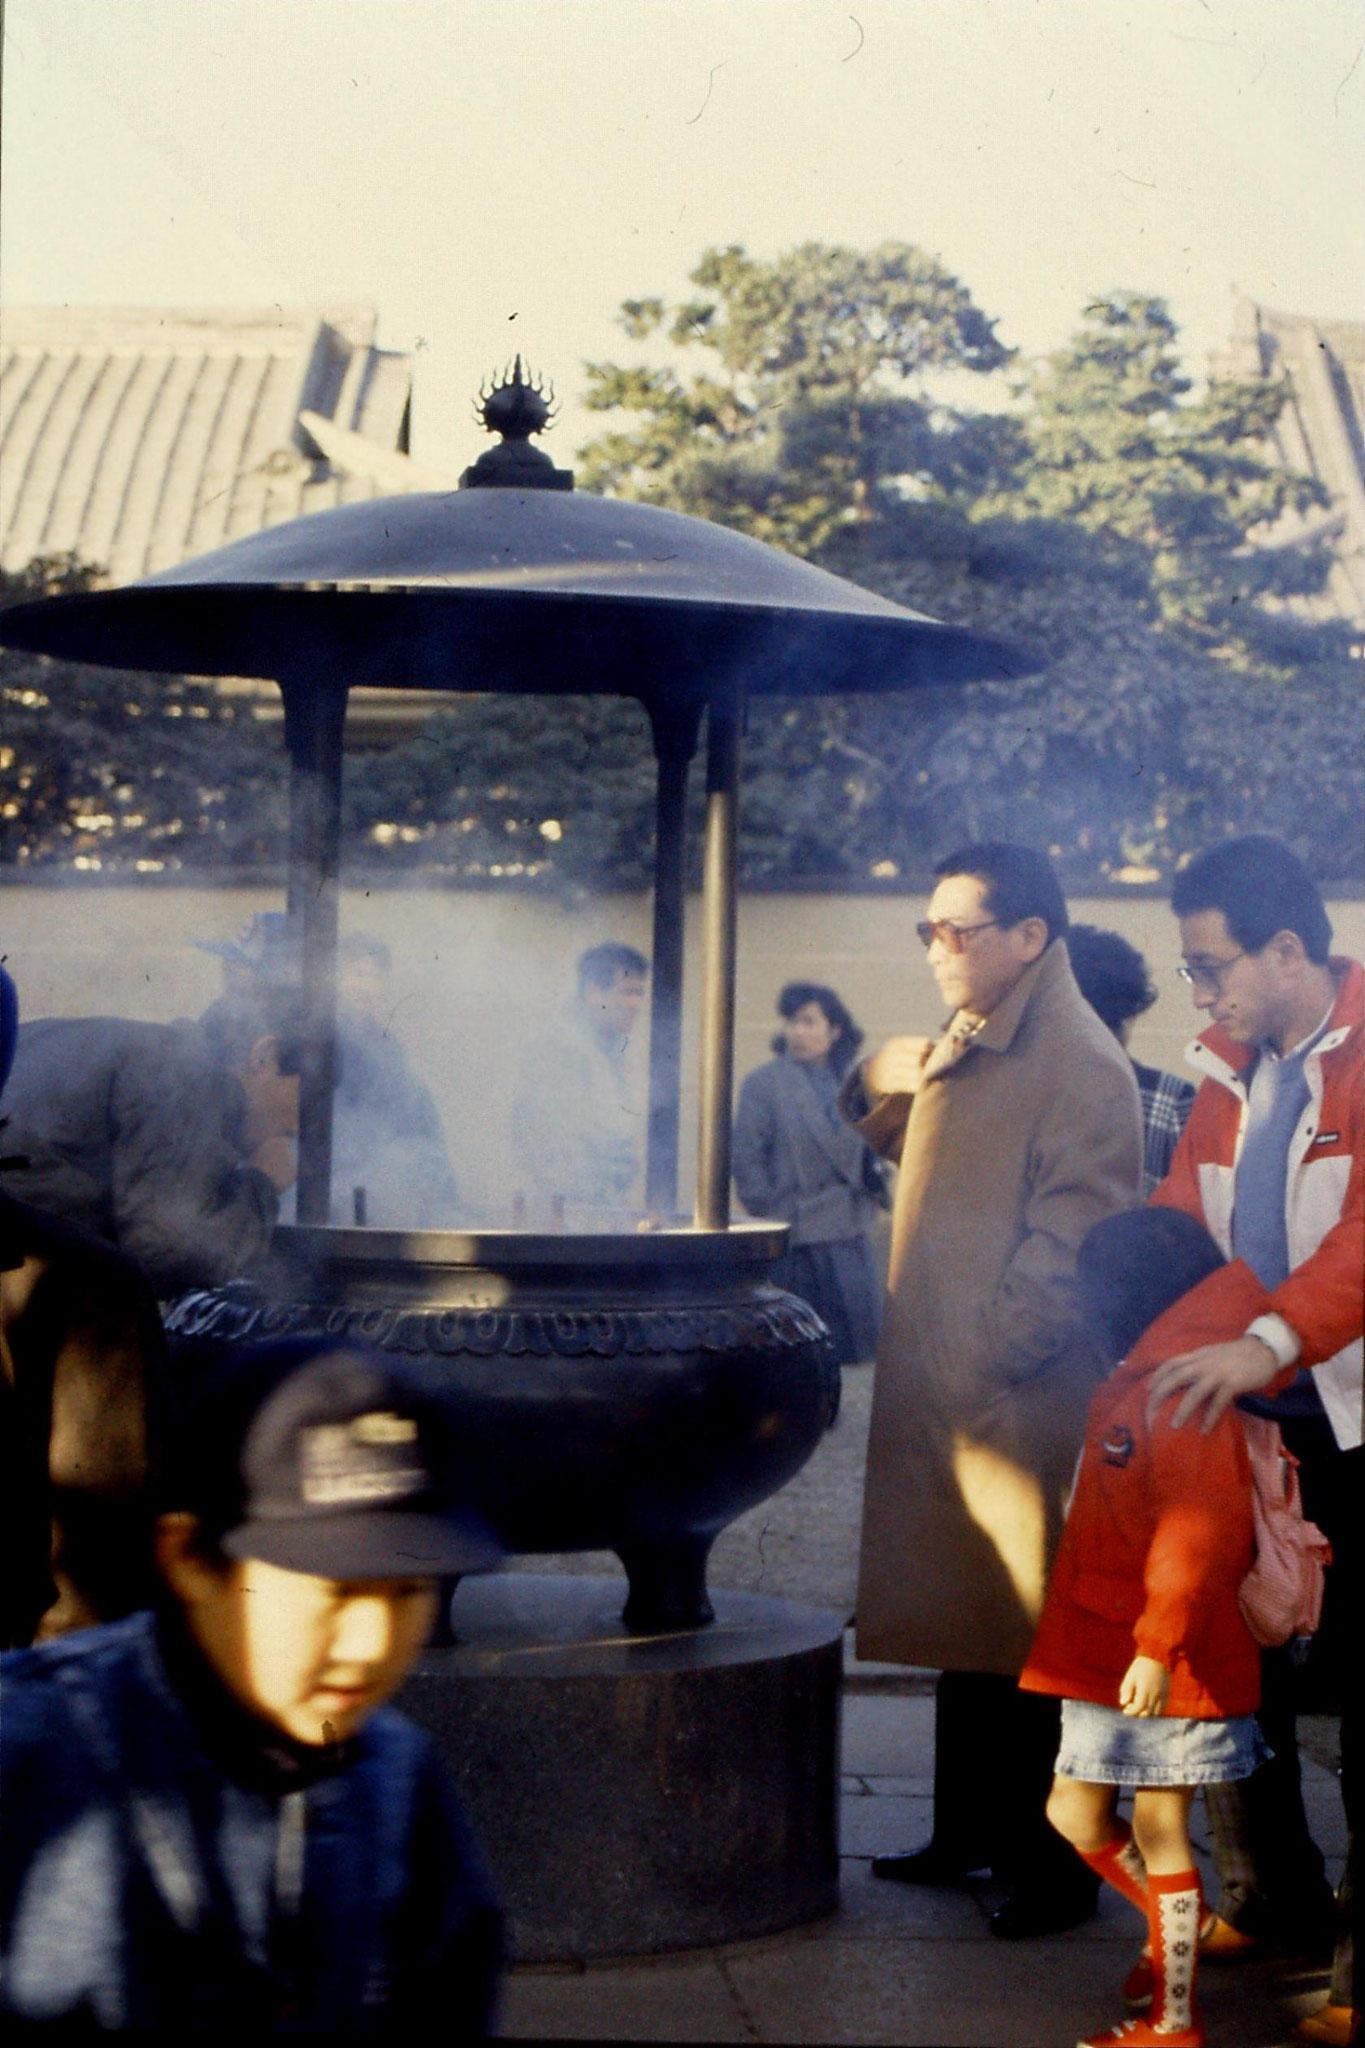 4/1/1989: 1: Ueno Park